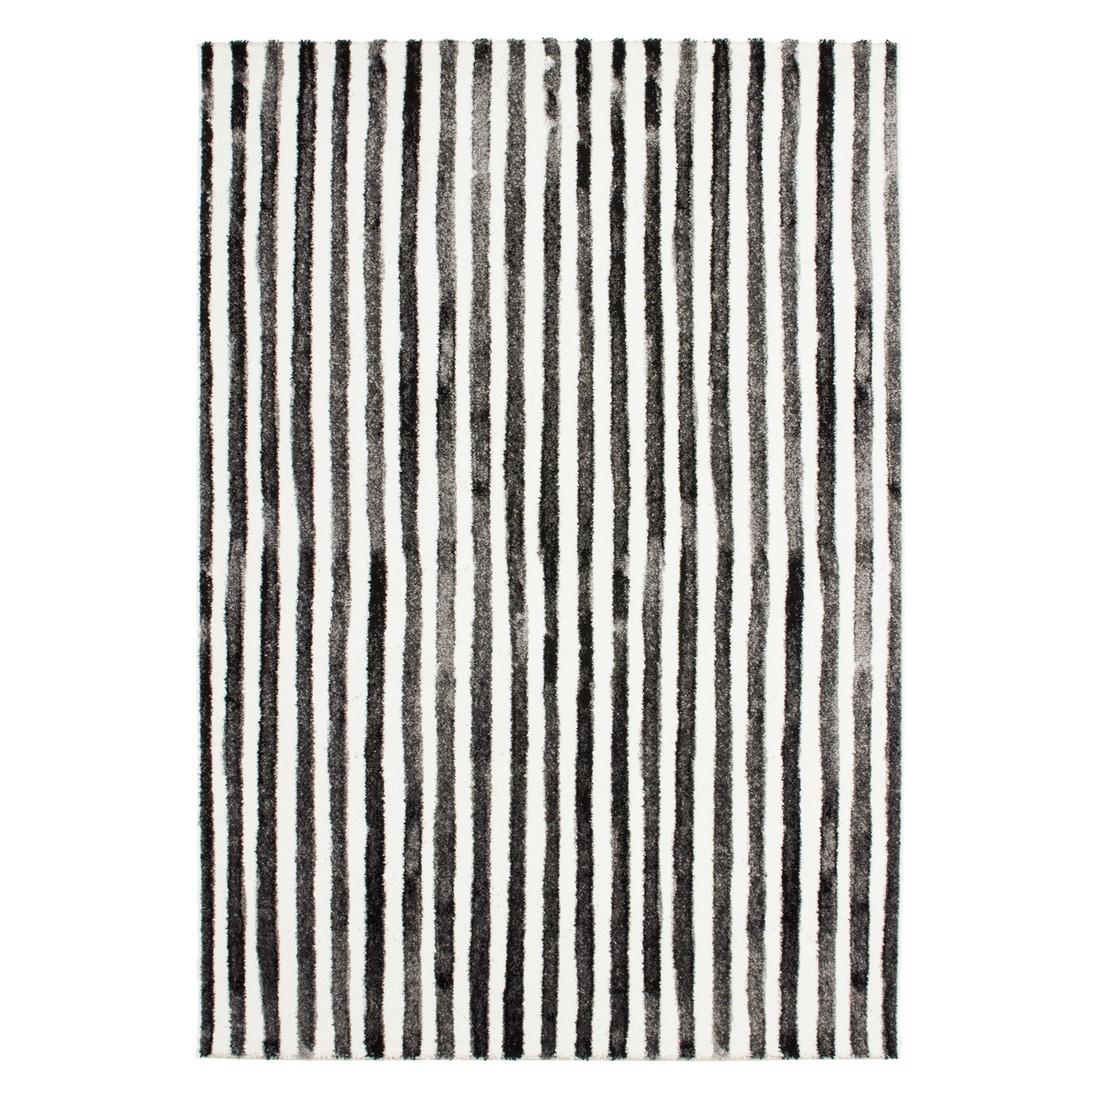 Teppich Vanity I – Grafit – 120 x 170 cm, Obsession kaufen